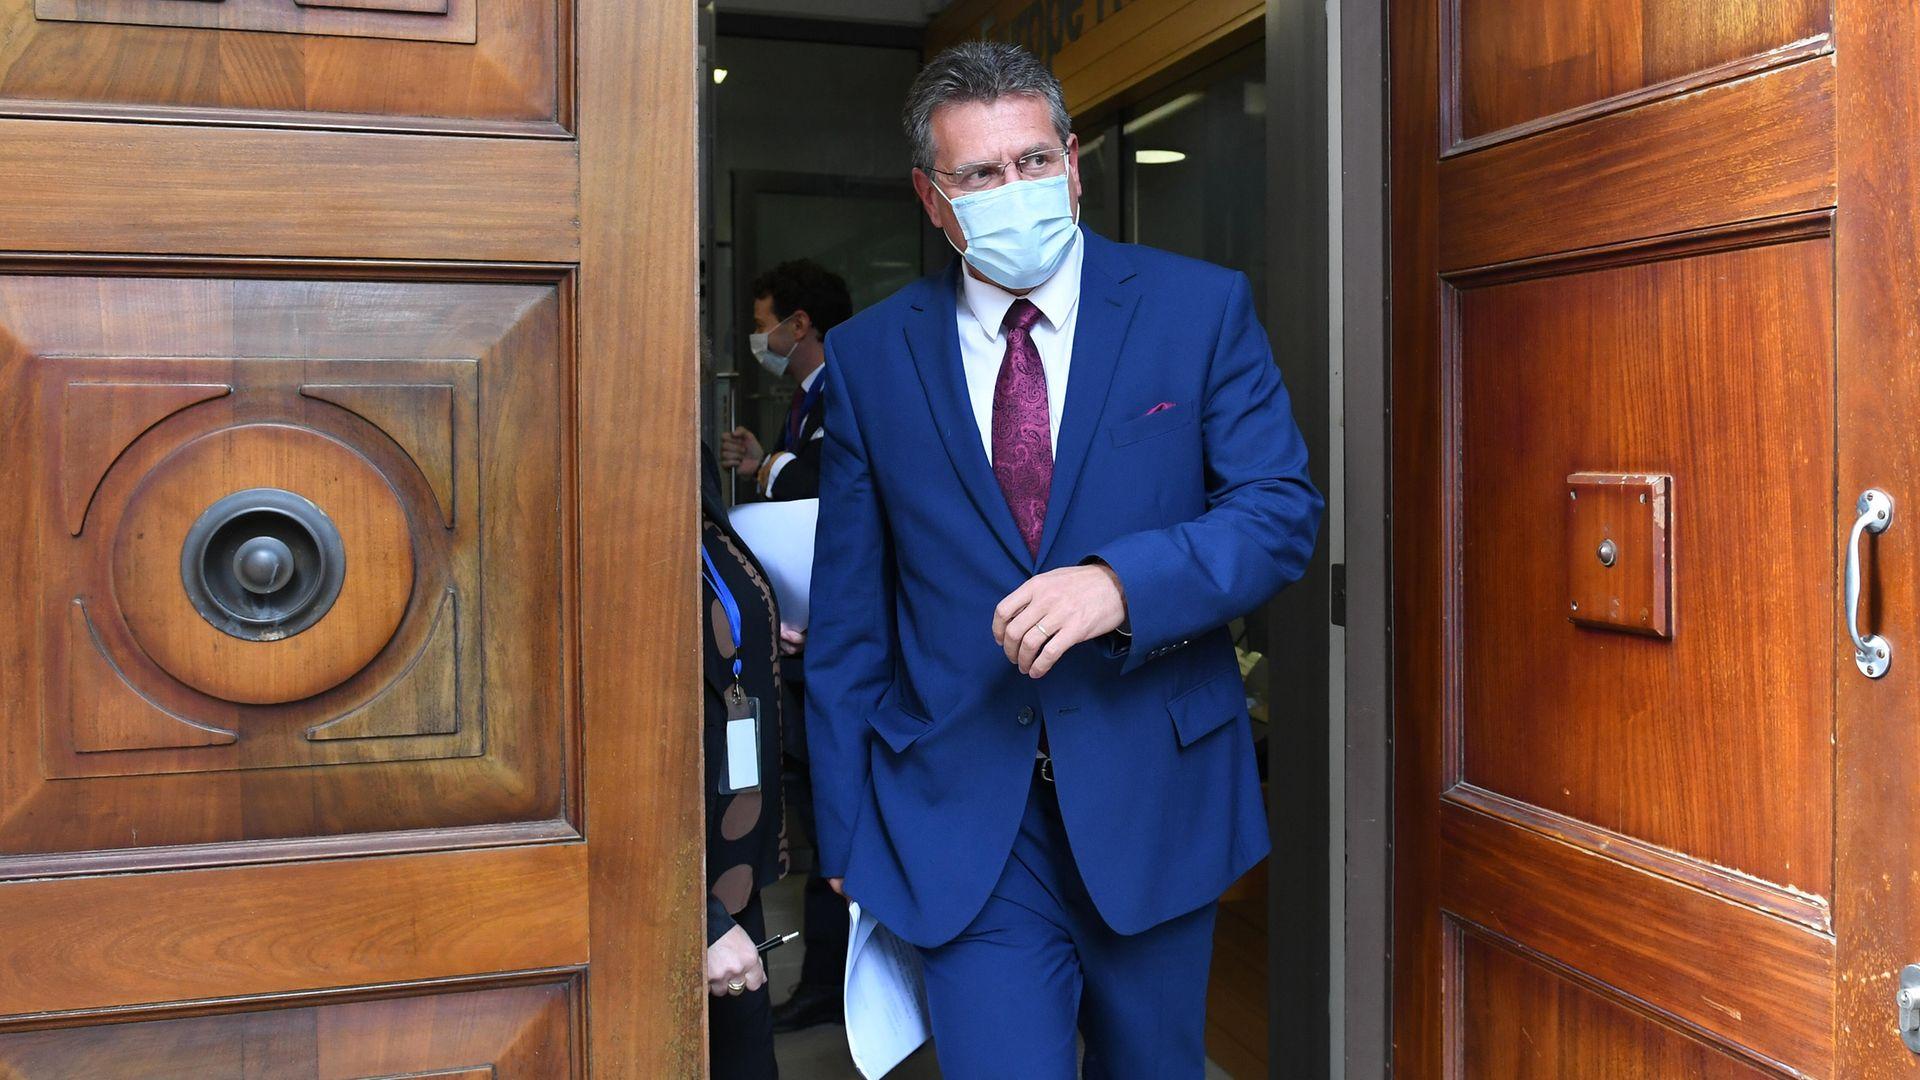 EU Commission vice-president Maros Sefcovic leaves EU House, London - Credit: PA